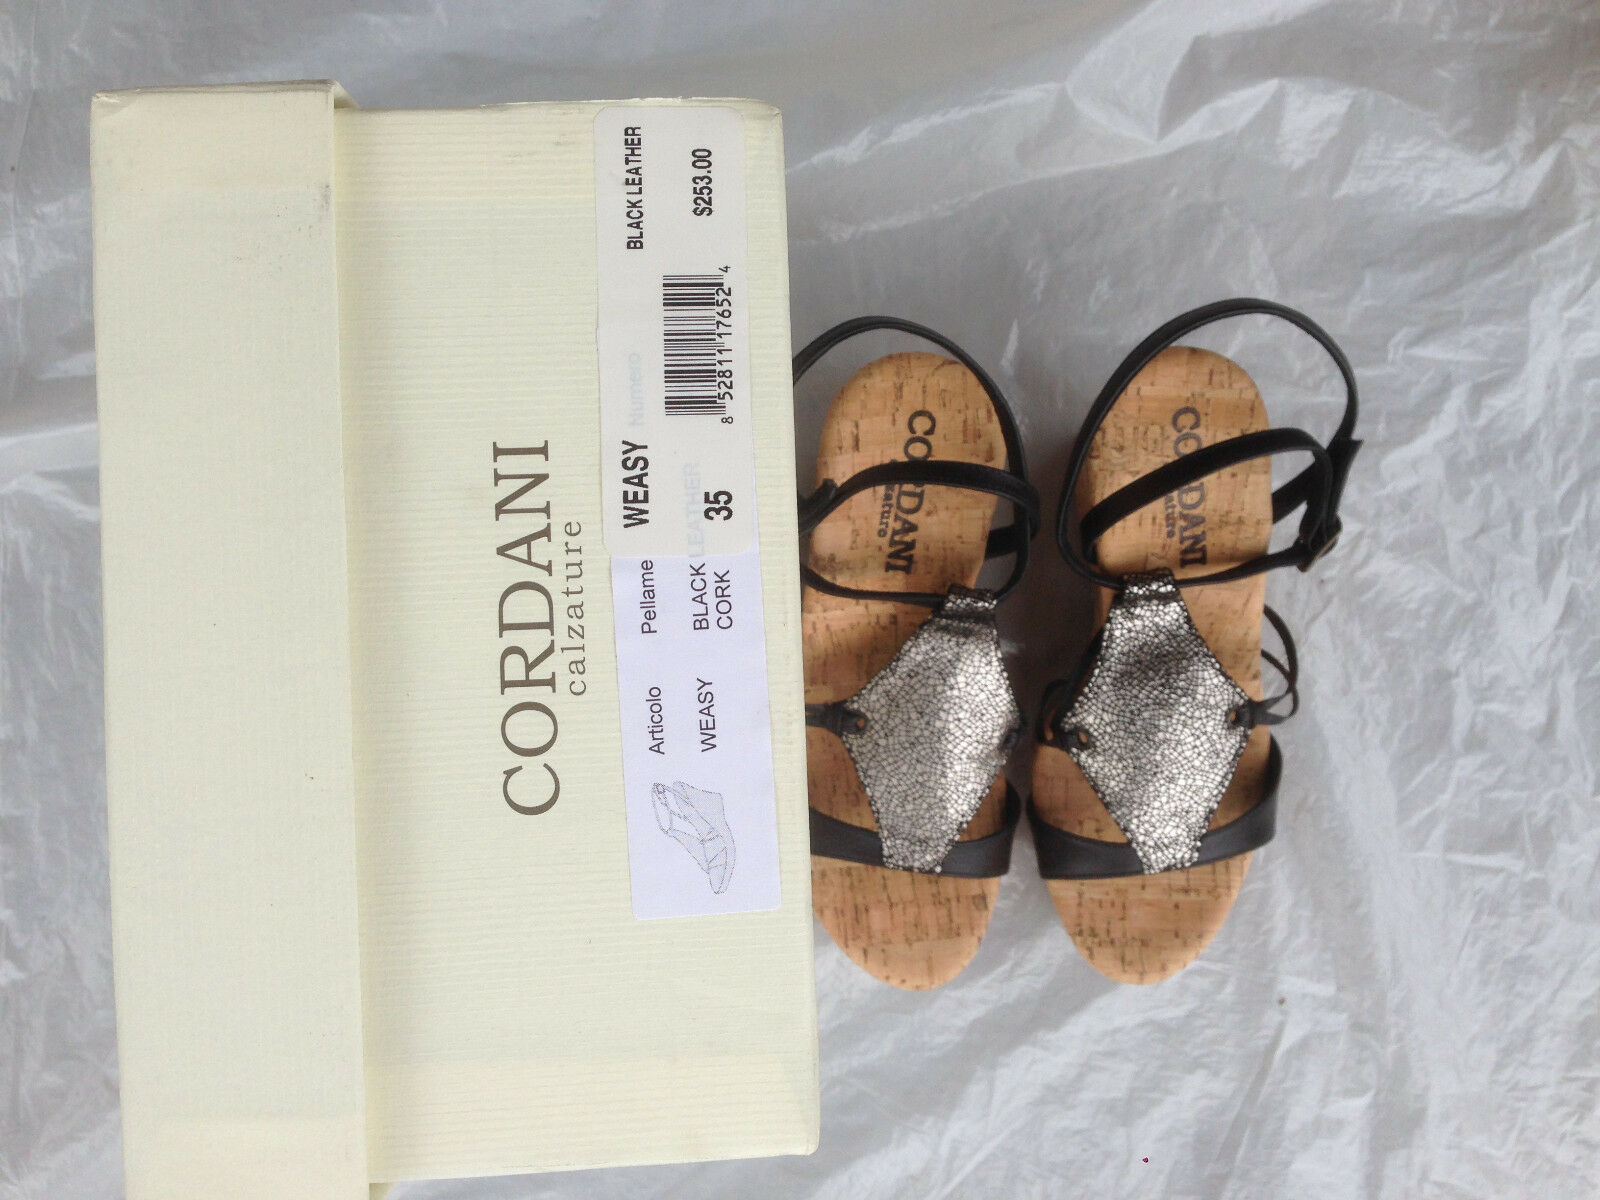 New CORDANI CORDANI CORDANI Cork Platform Wedge WEASY Metallic Wedge Sandal chaussures  253 sz 35 36 1a50cd